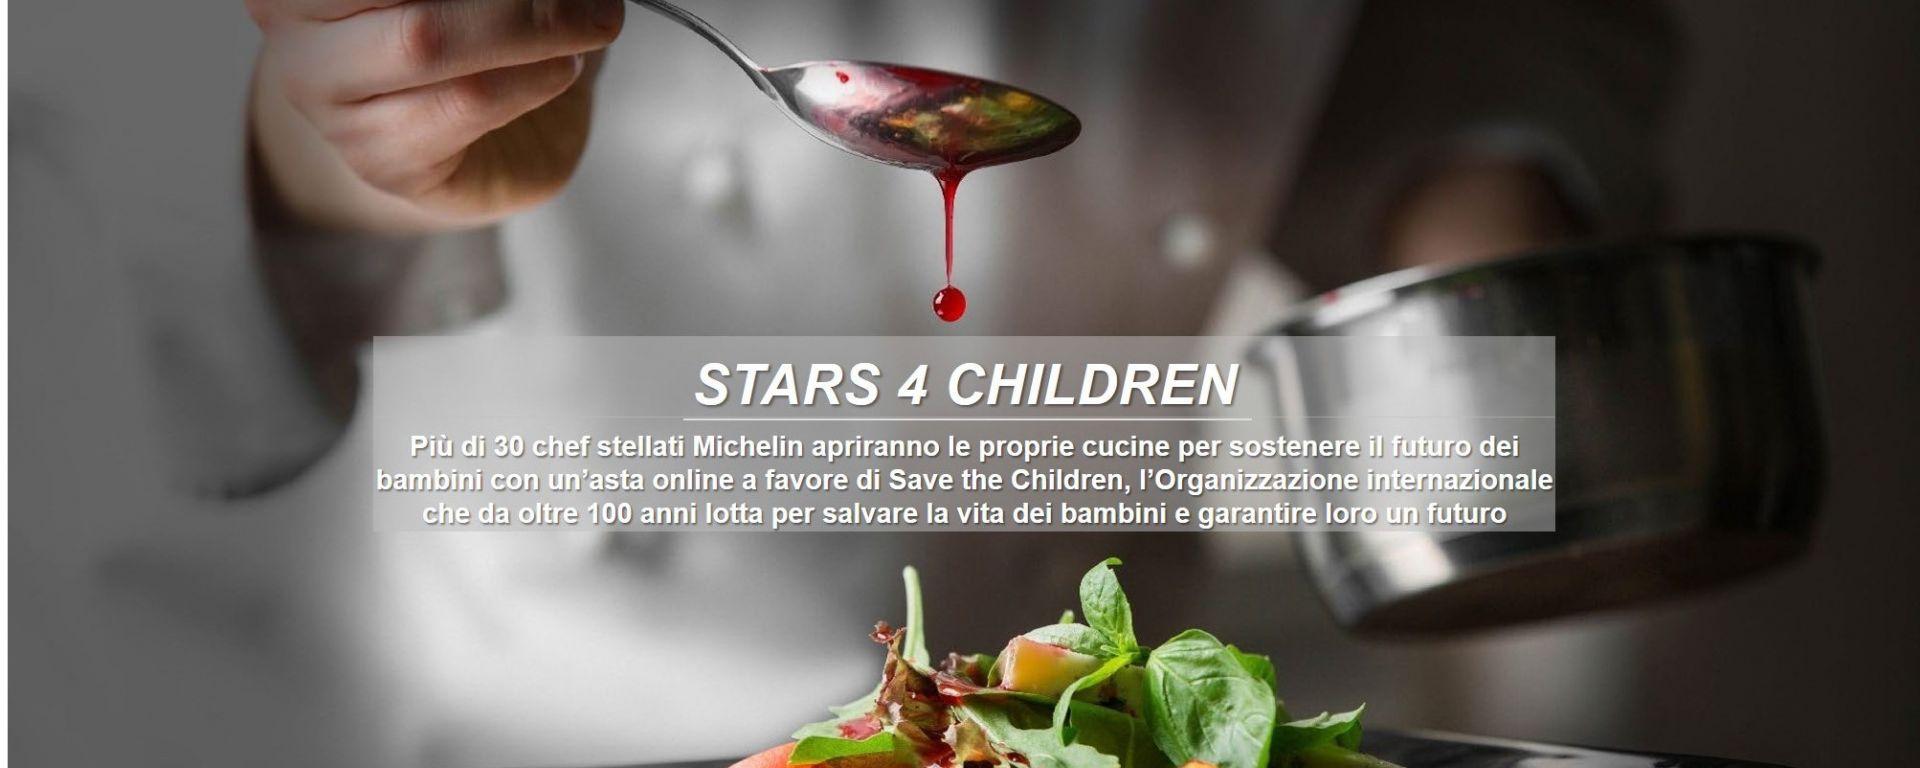 Michelin Stars 4 Children